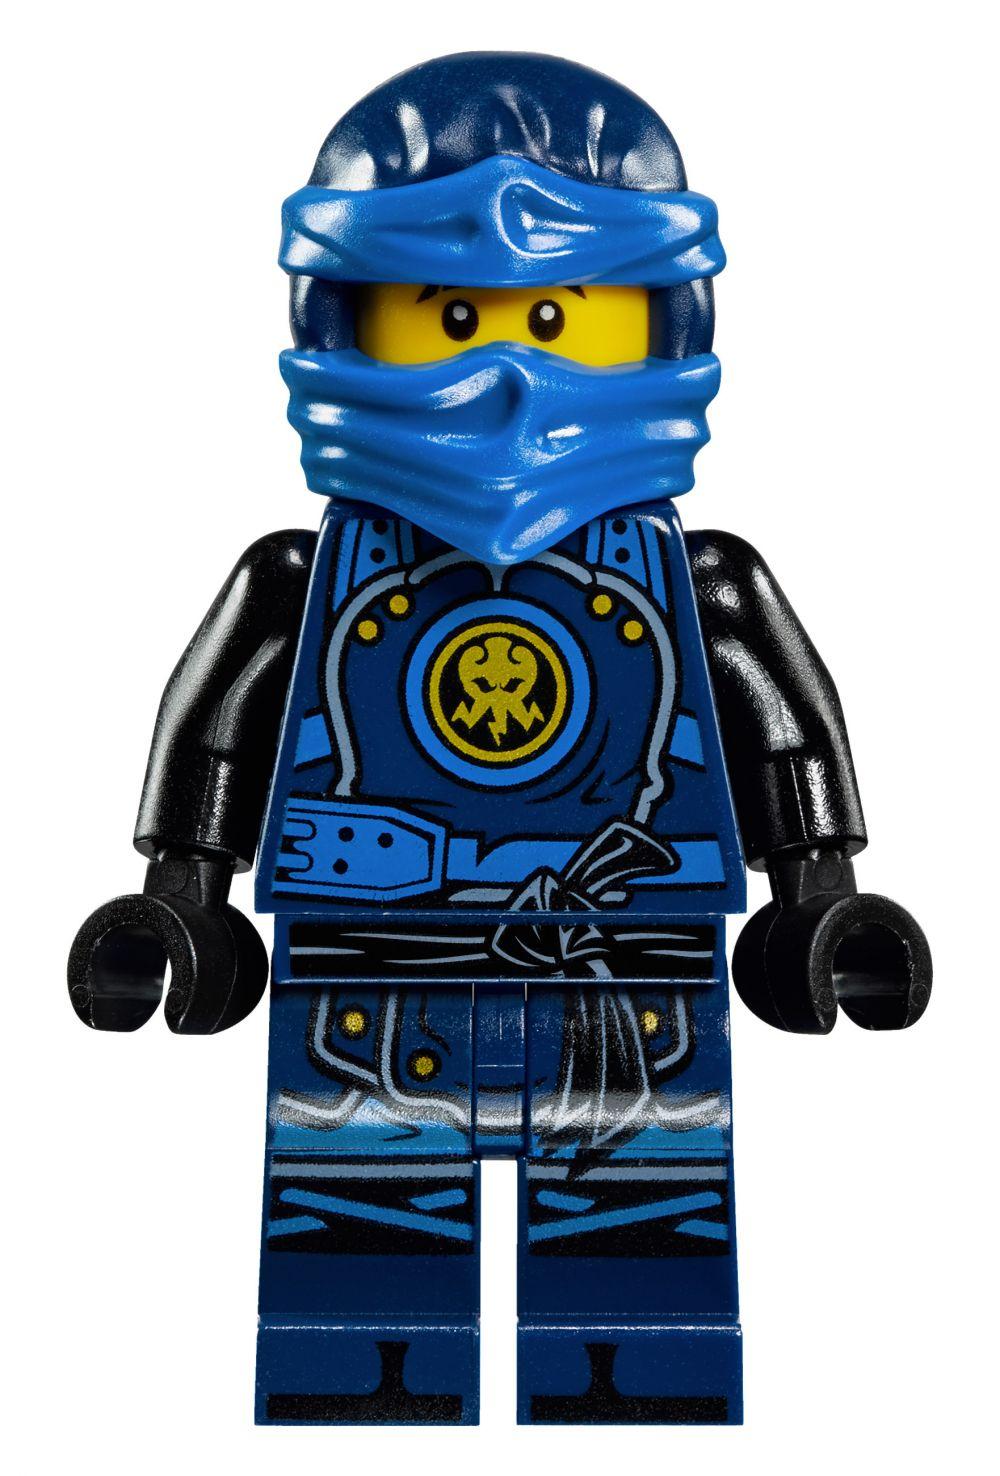 Lego ninjago 70622 pas cher l clair du d sert - Photo ninjago ...